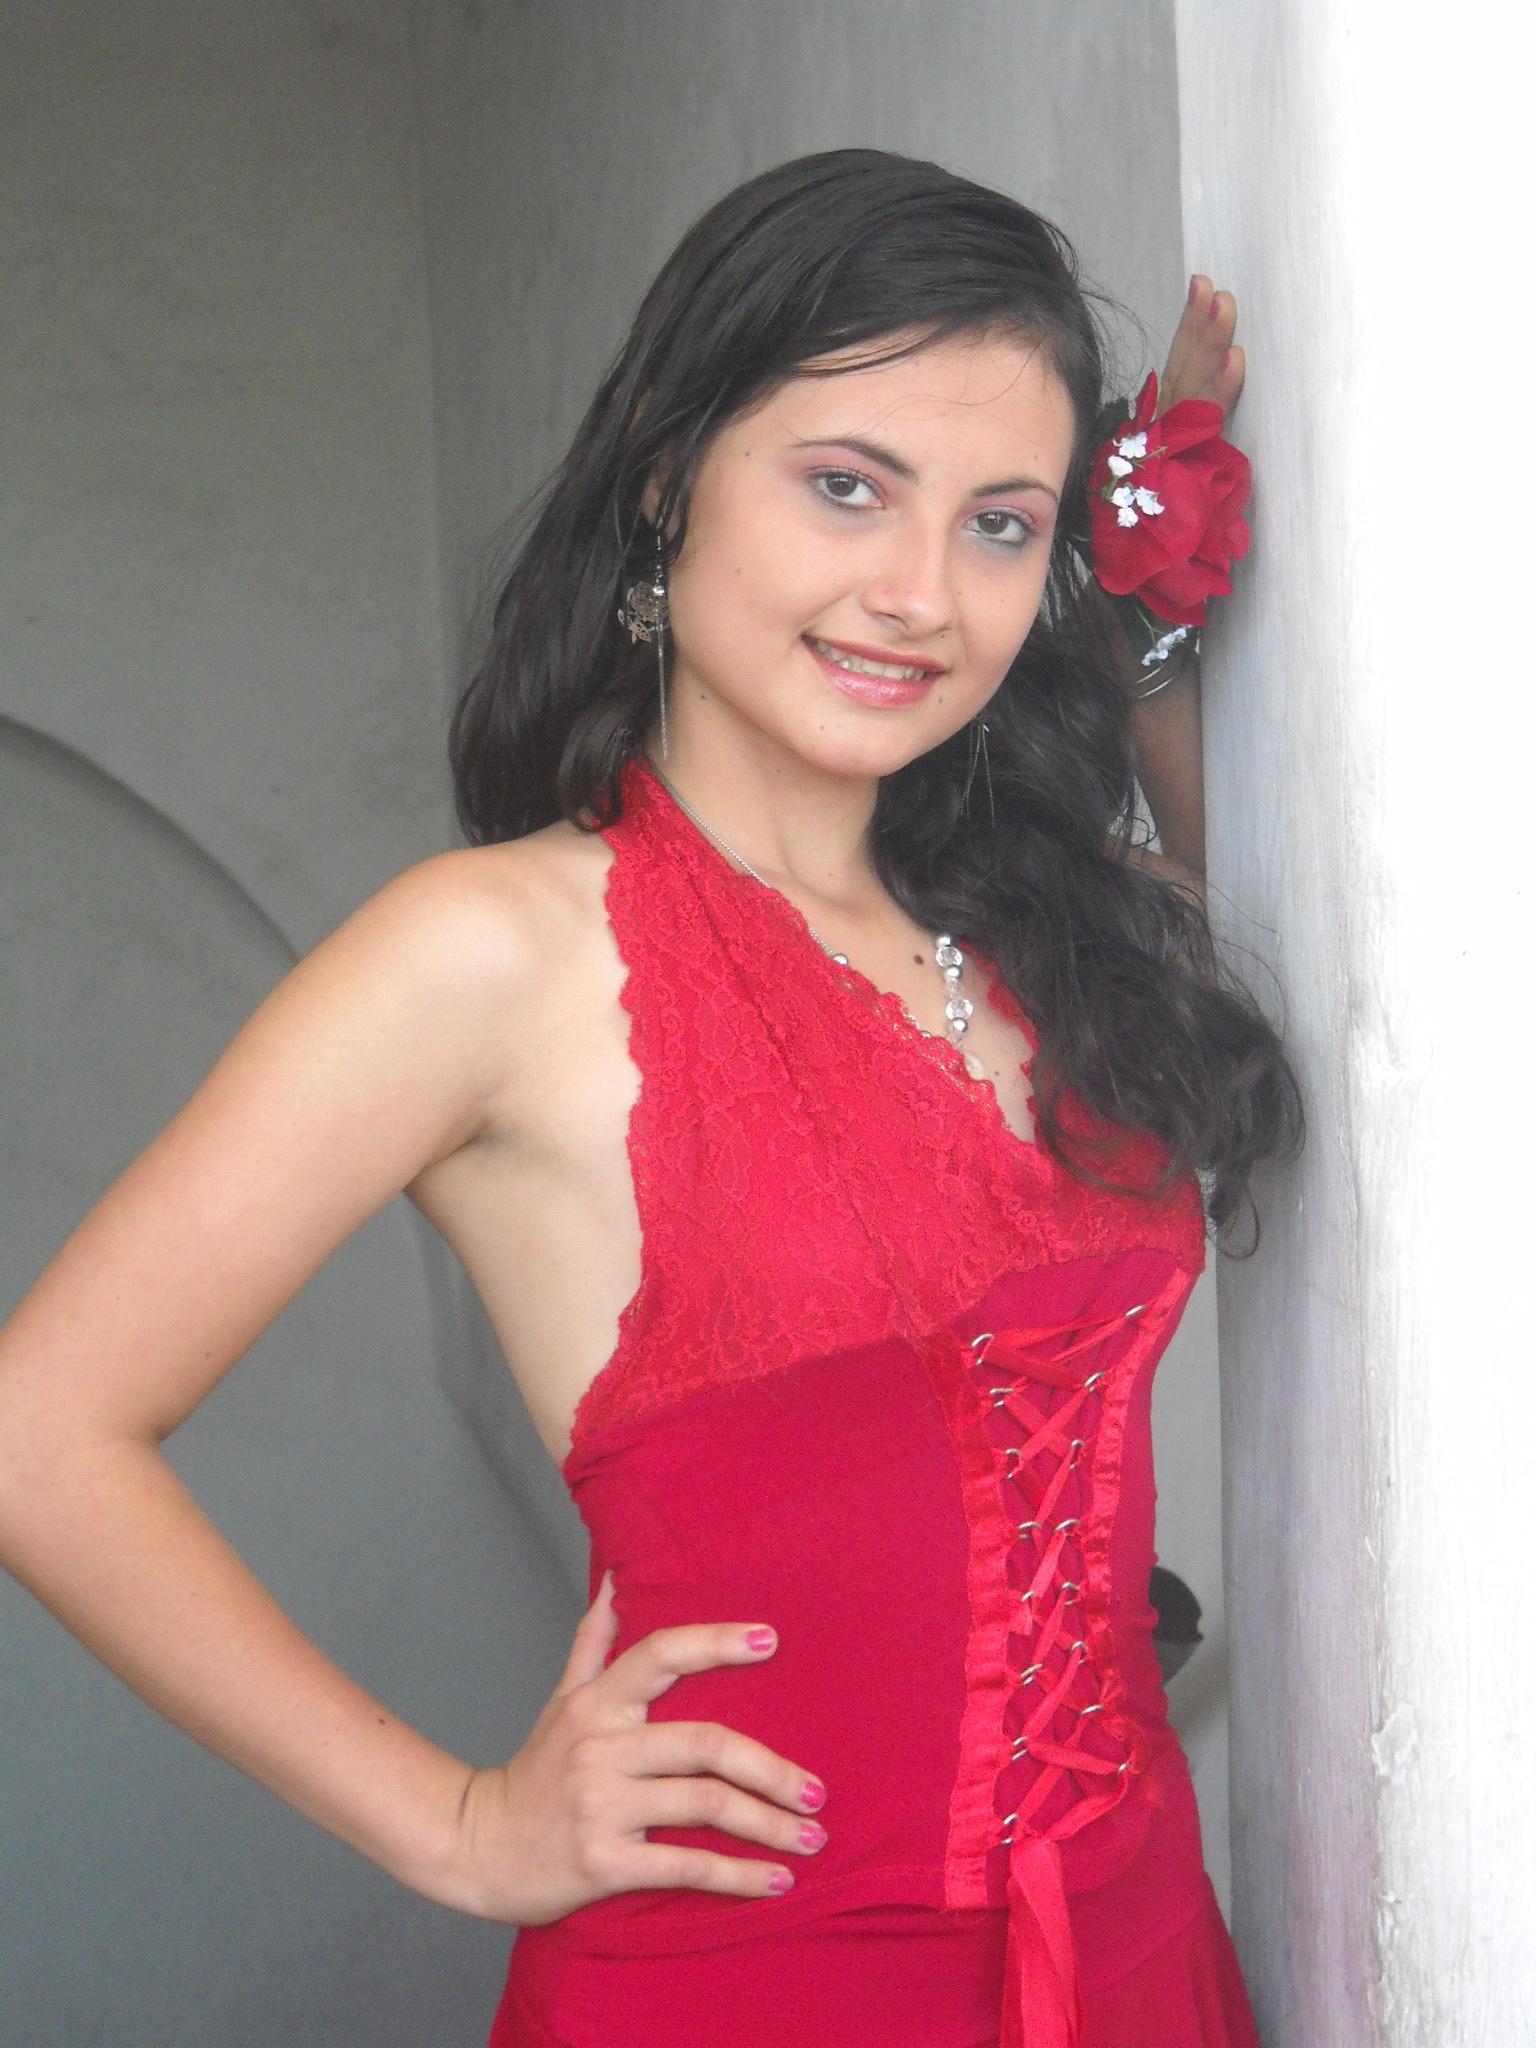 Traje De Baño Rojo Andrea:zoila portillo en traje de baño